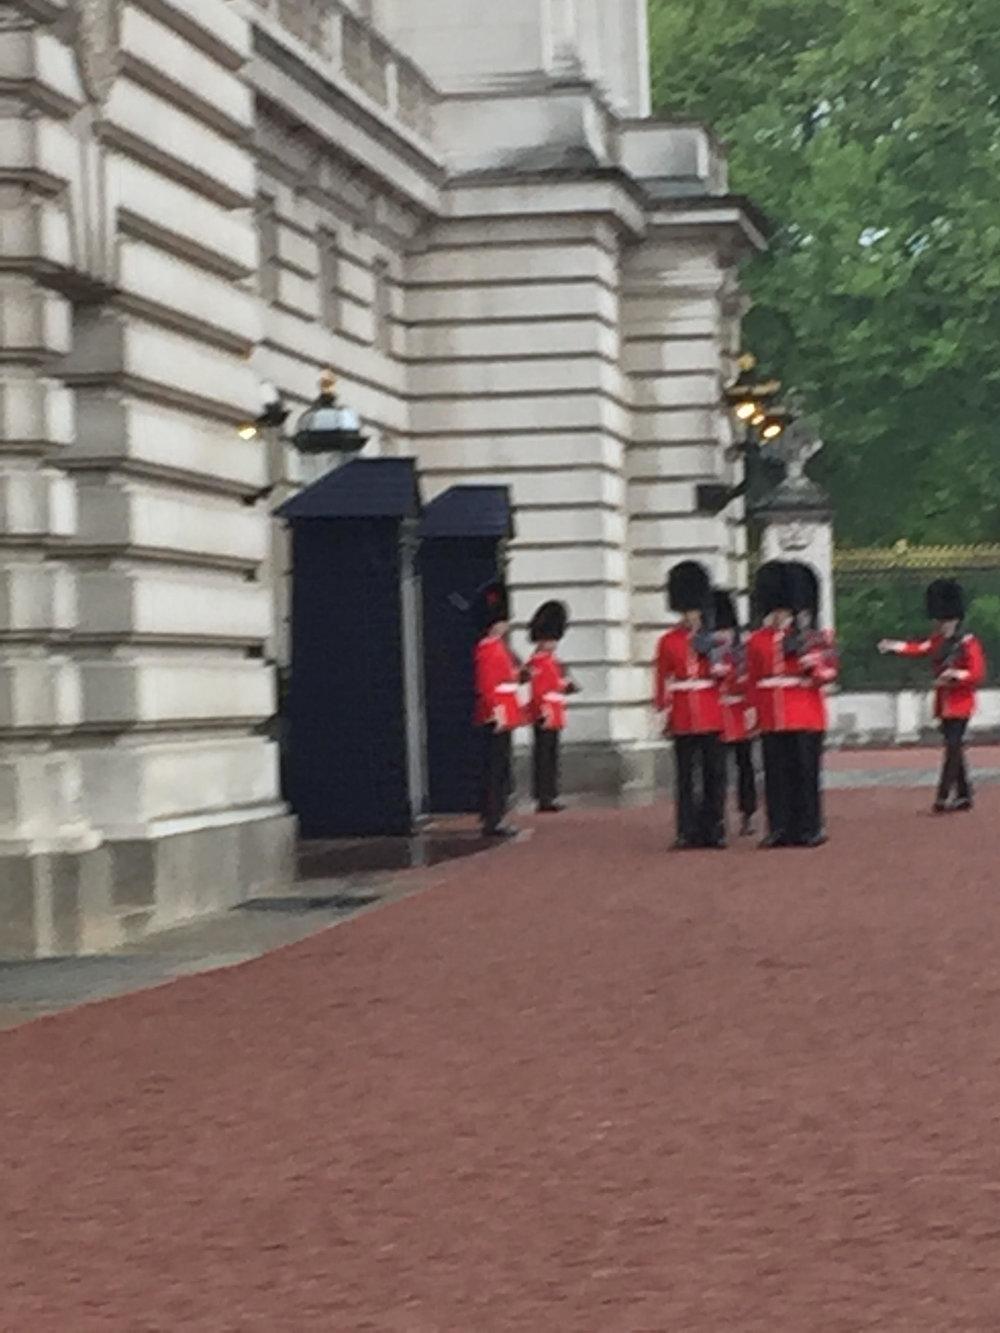 Buckingham-Palace-1.jpg